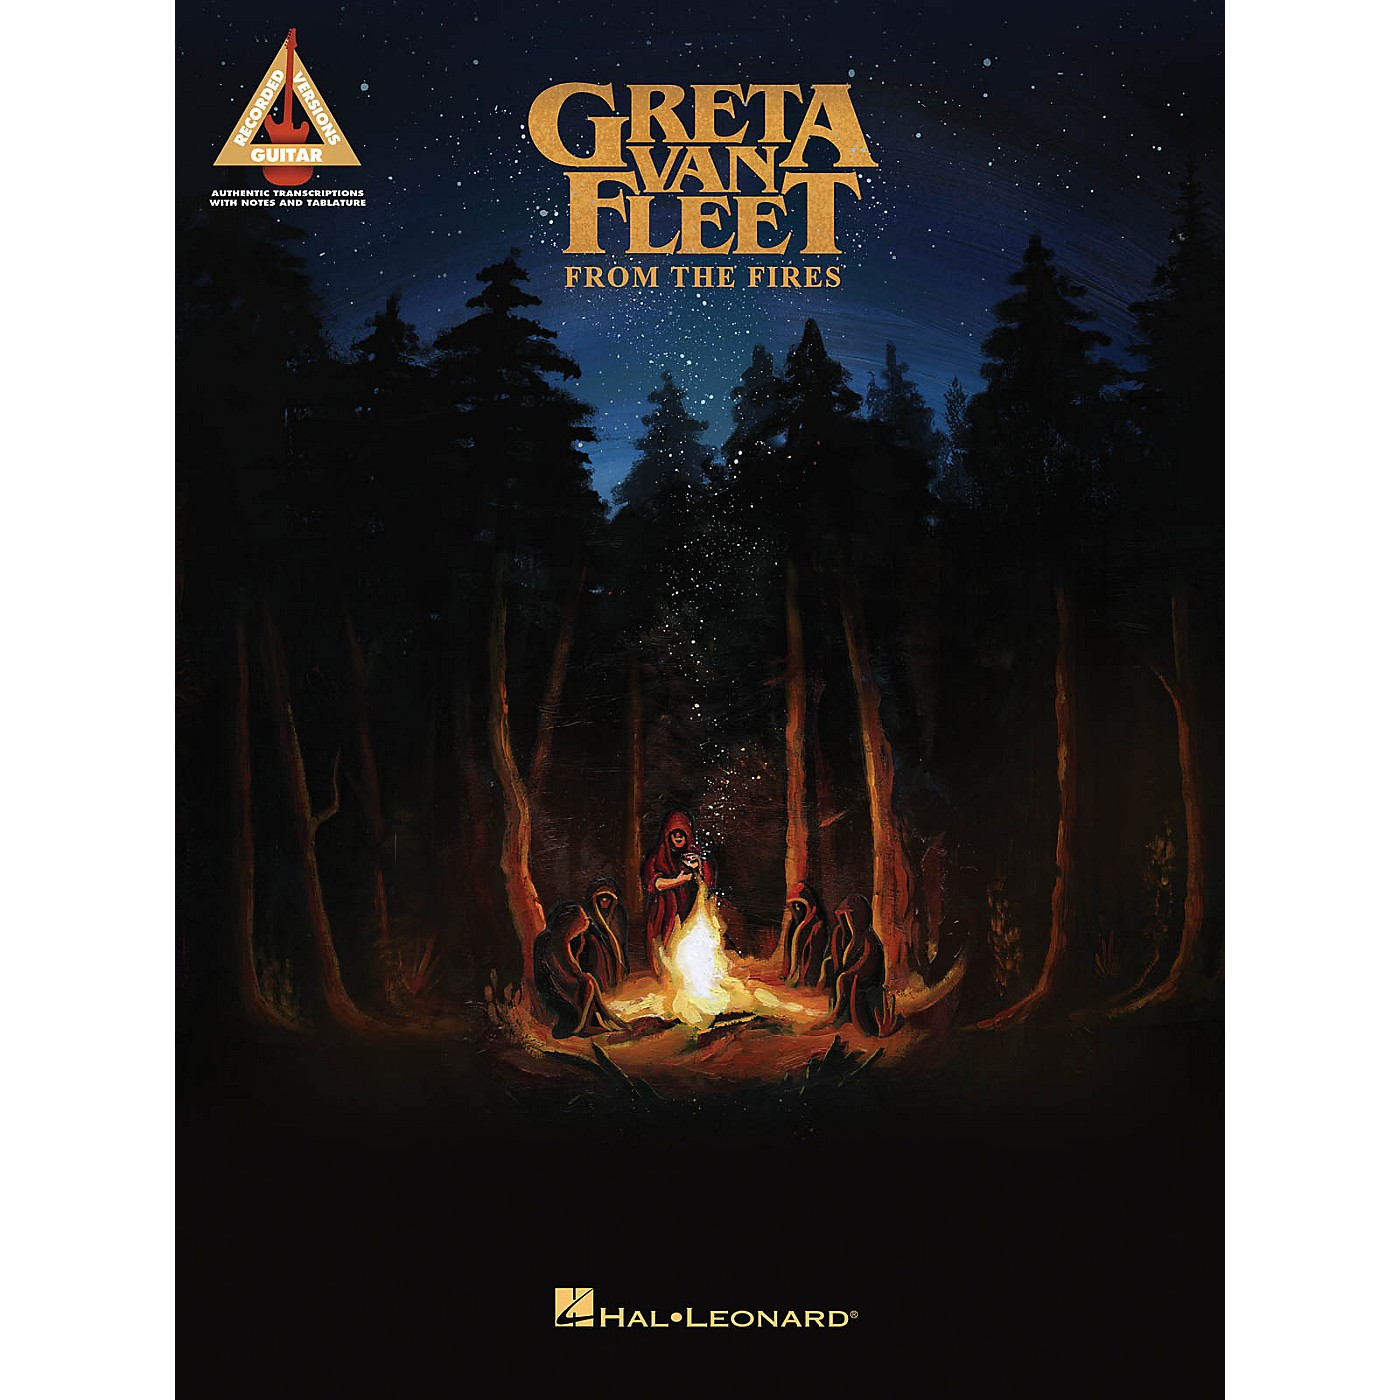 Hal Leonard Greta Van Fleet - From the Fires Guitar Tab Songbook thumbnail